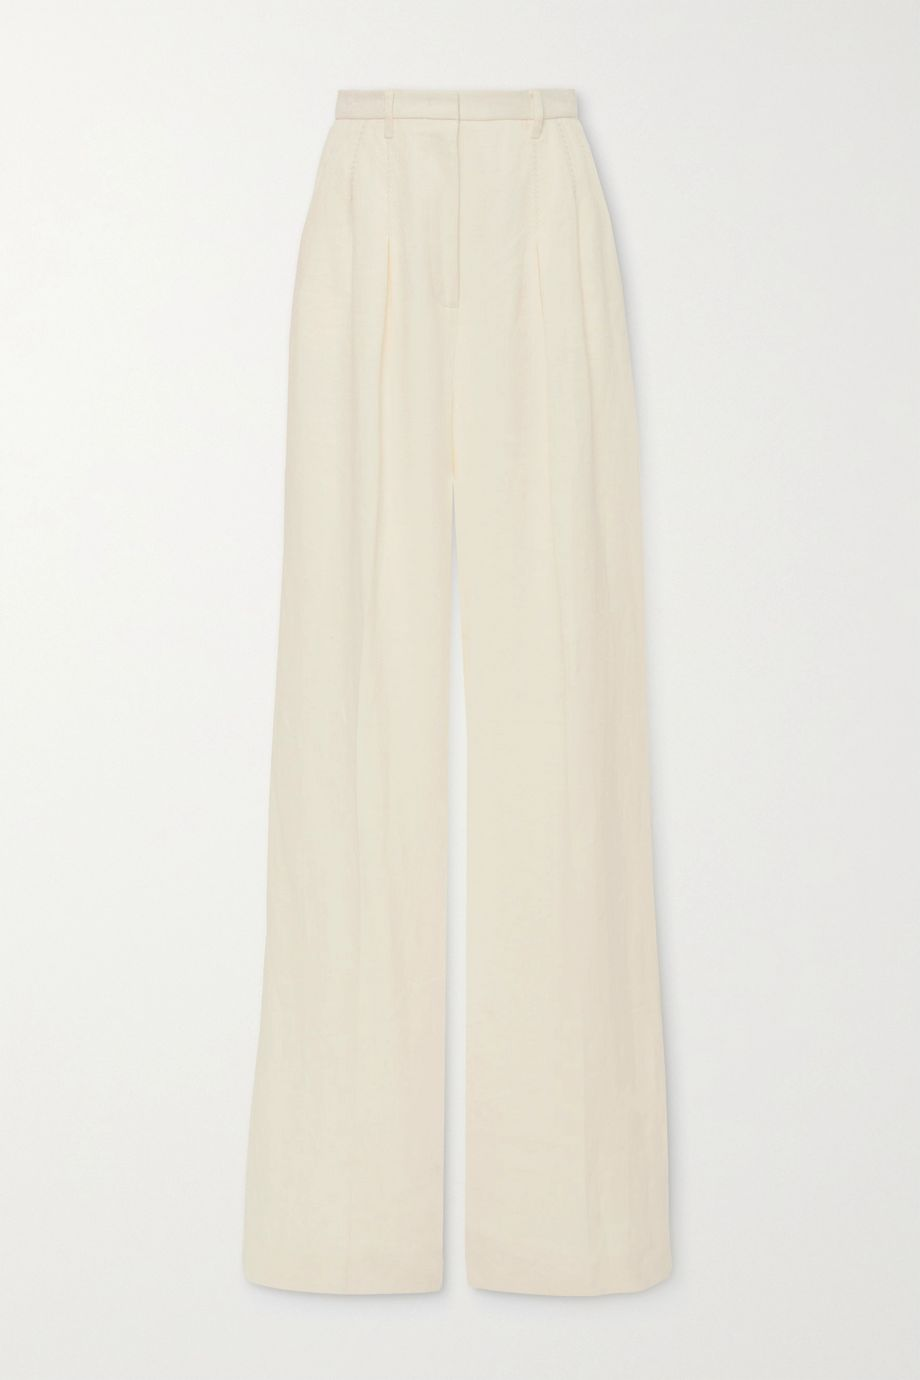 Gabriela Hearst Pantalon large en lin Vargas